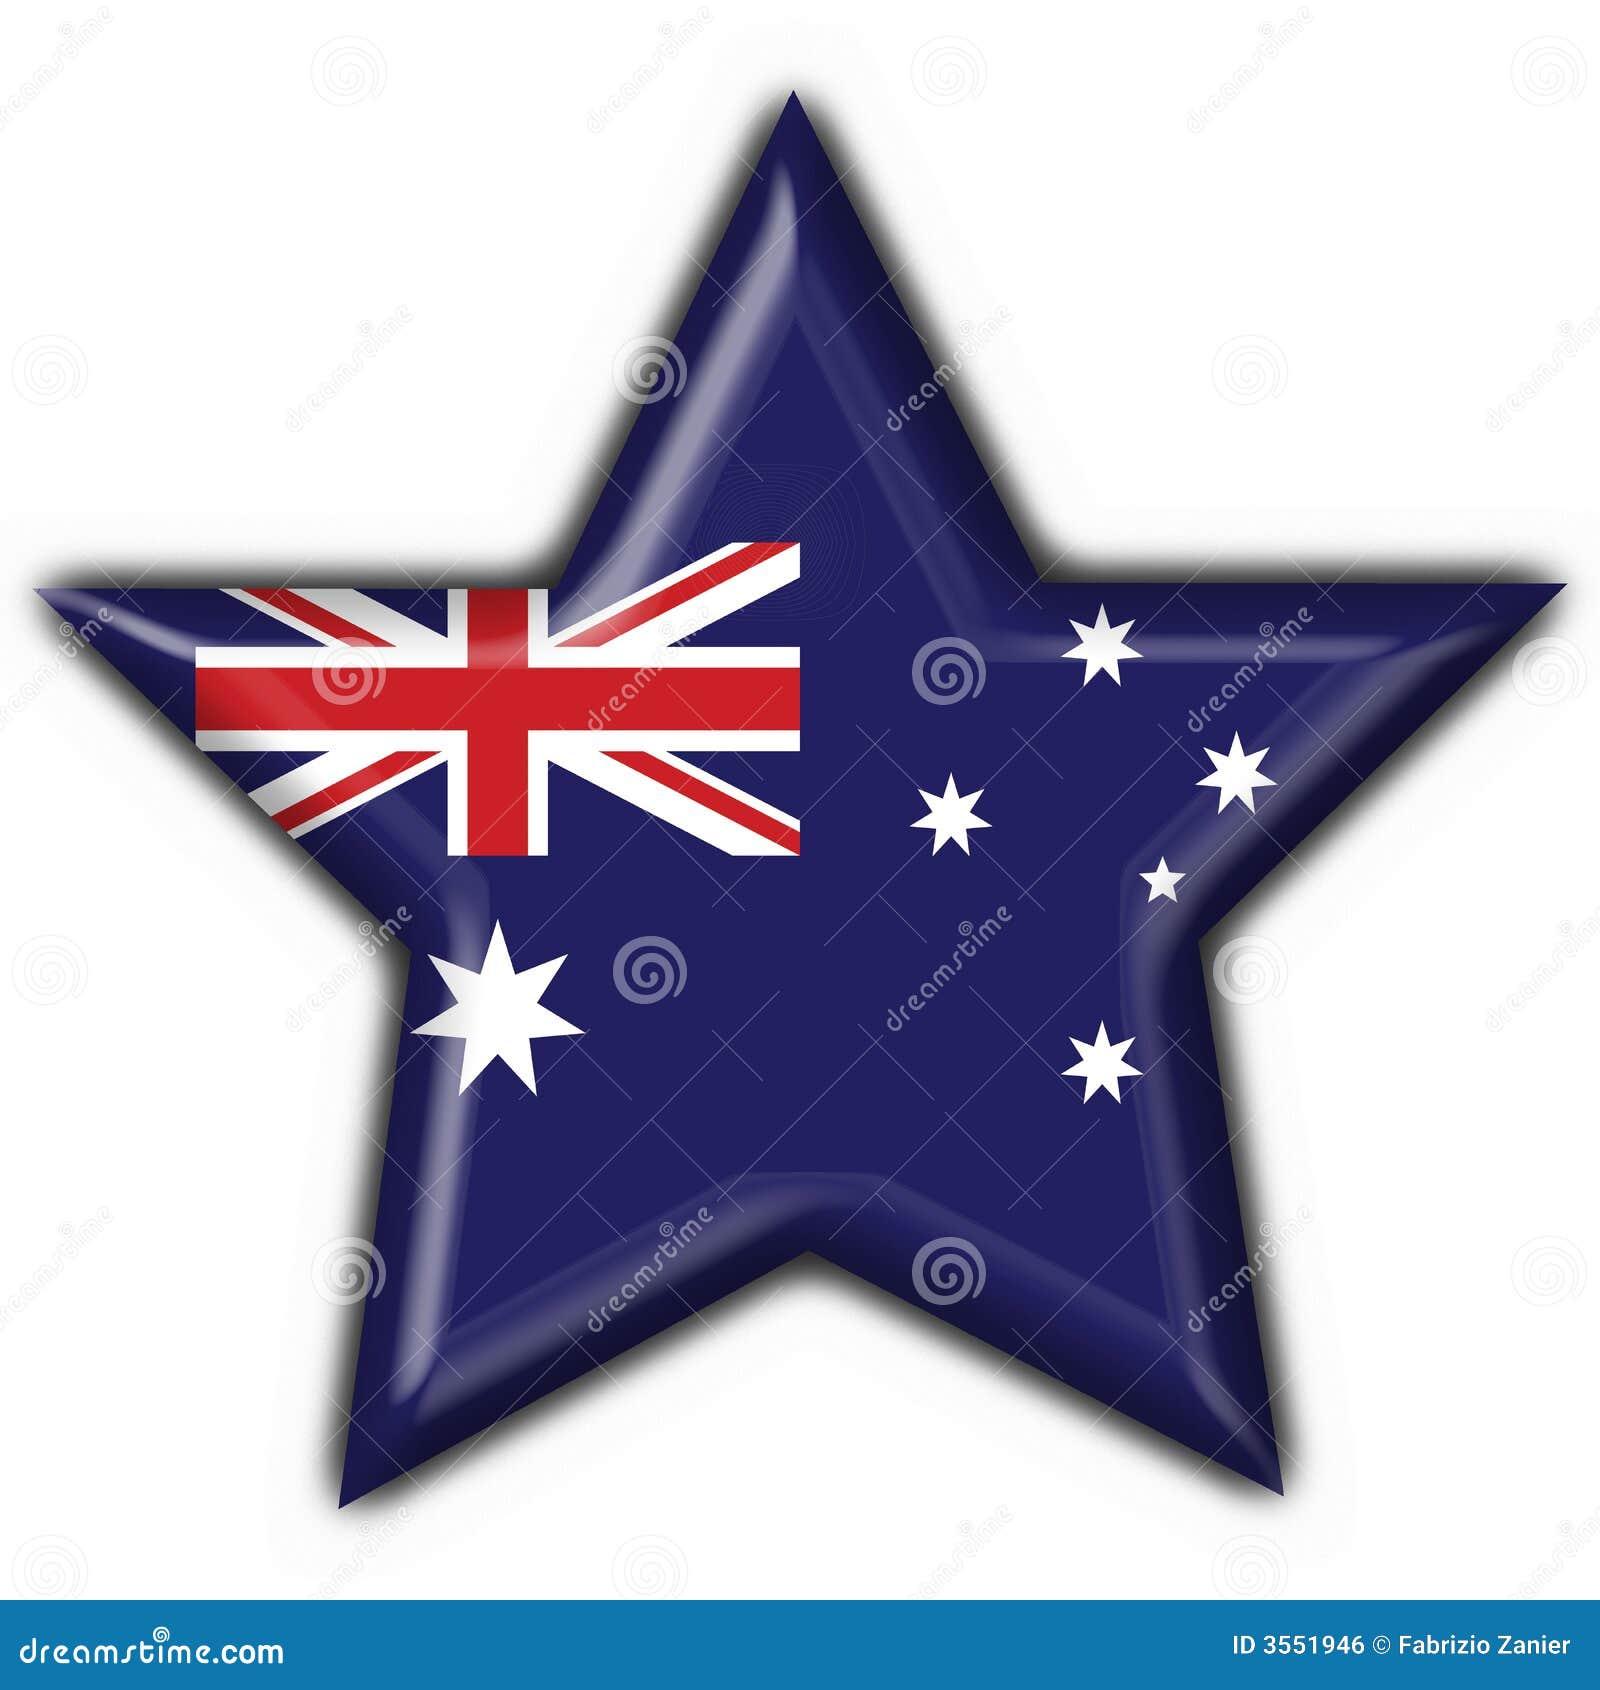 smart business plans australia flag